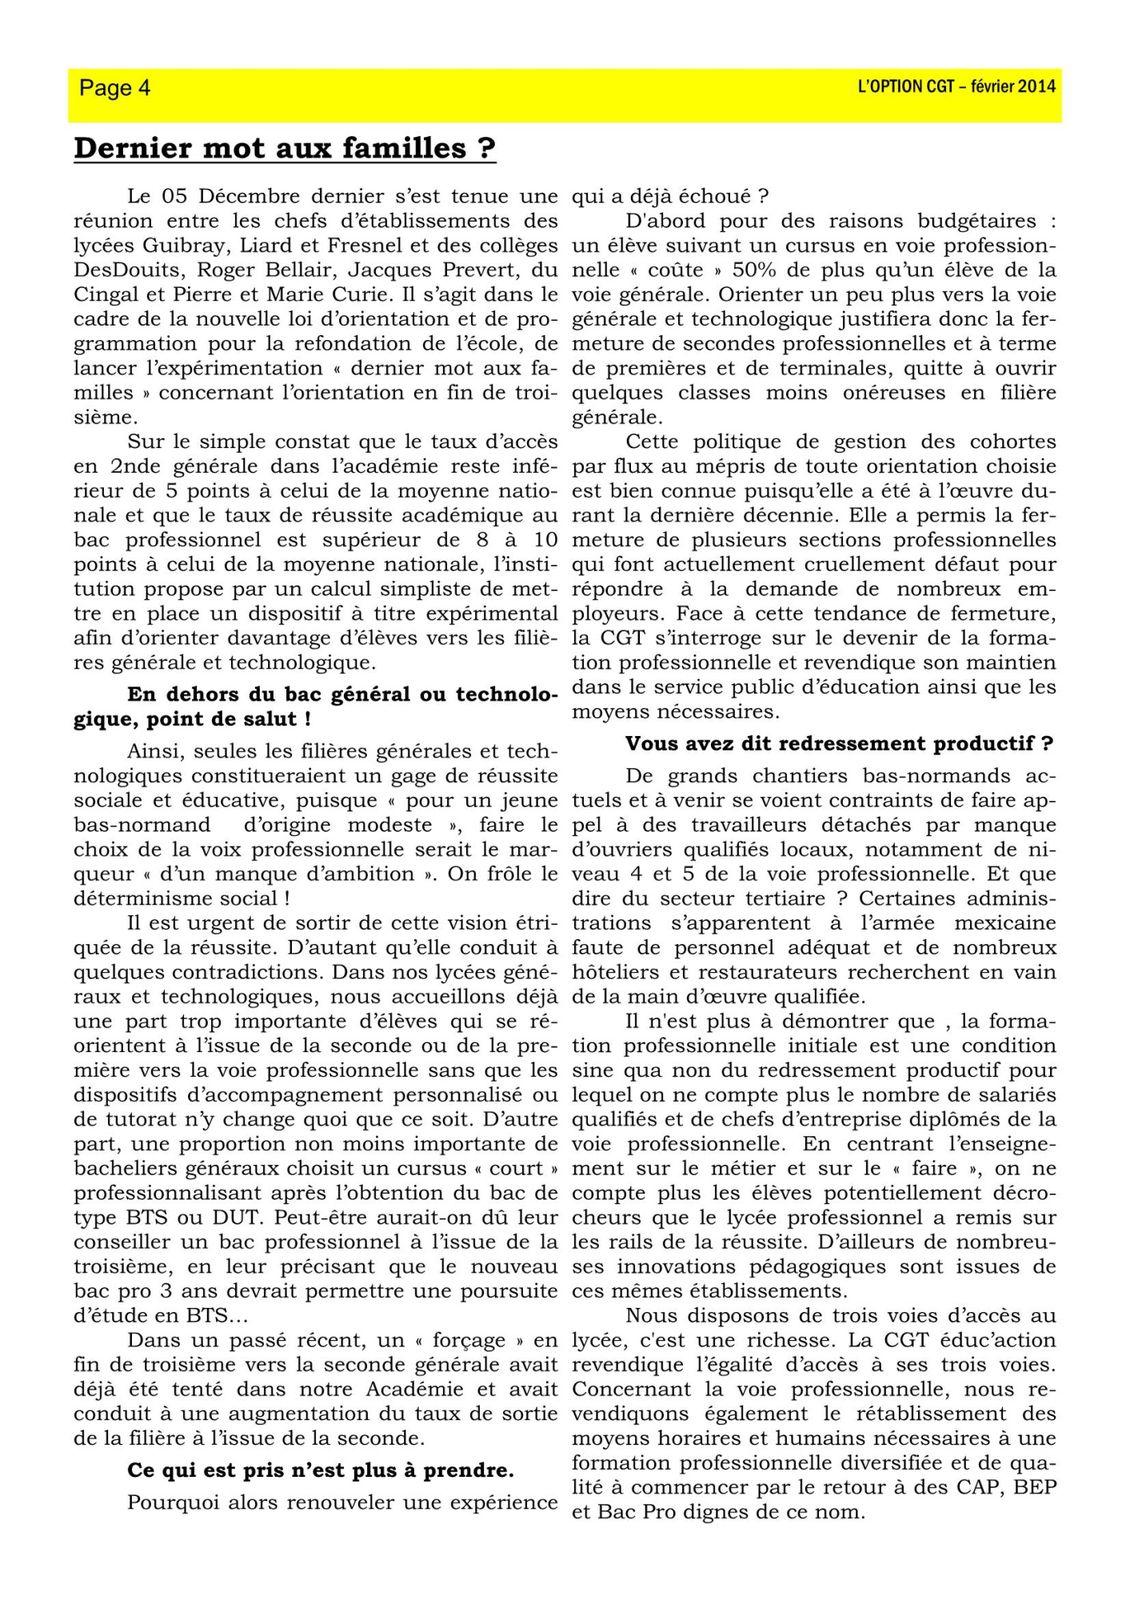 L-option CGT février 2014-10004